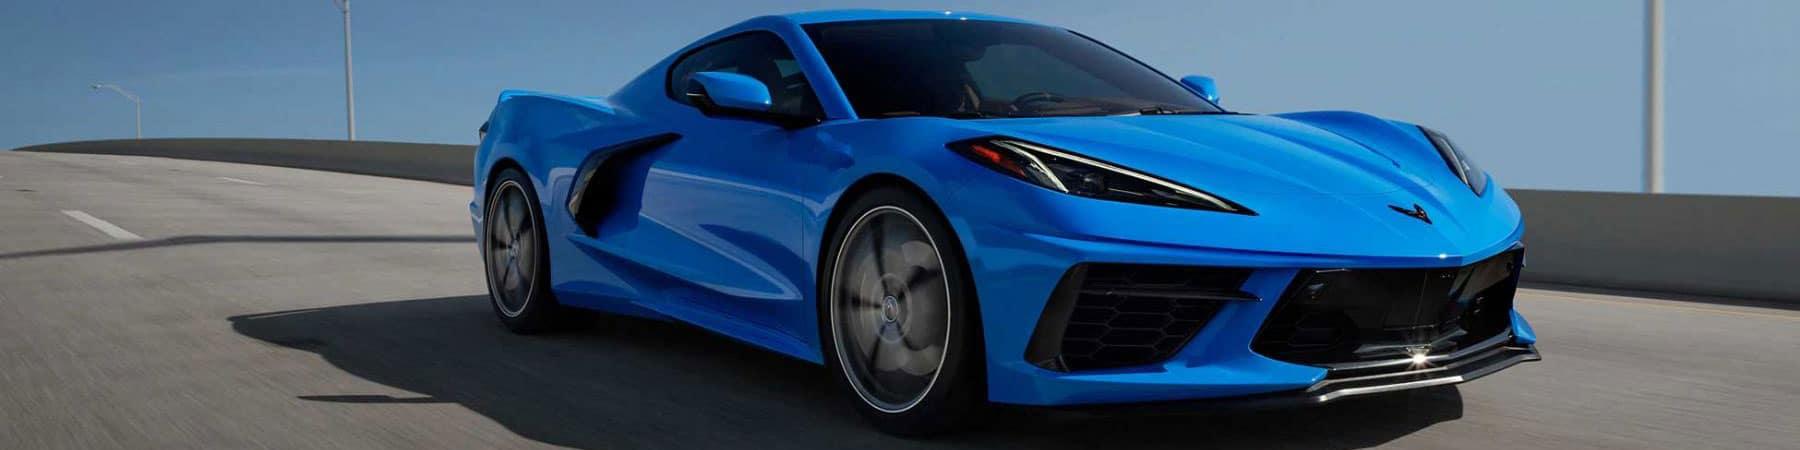 2021 Corvette for sale in Savannah, MO